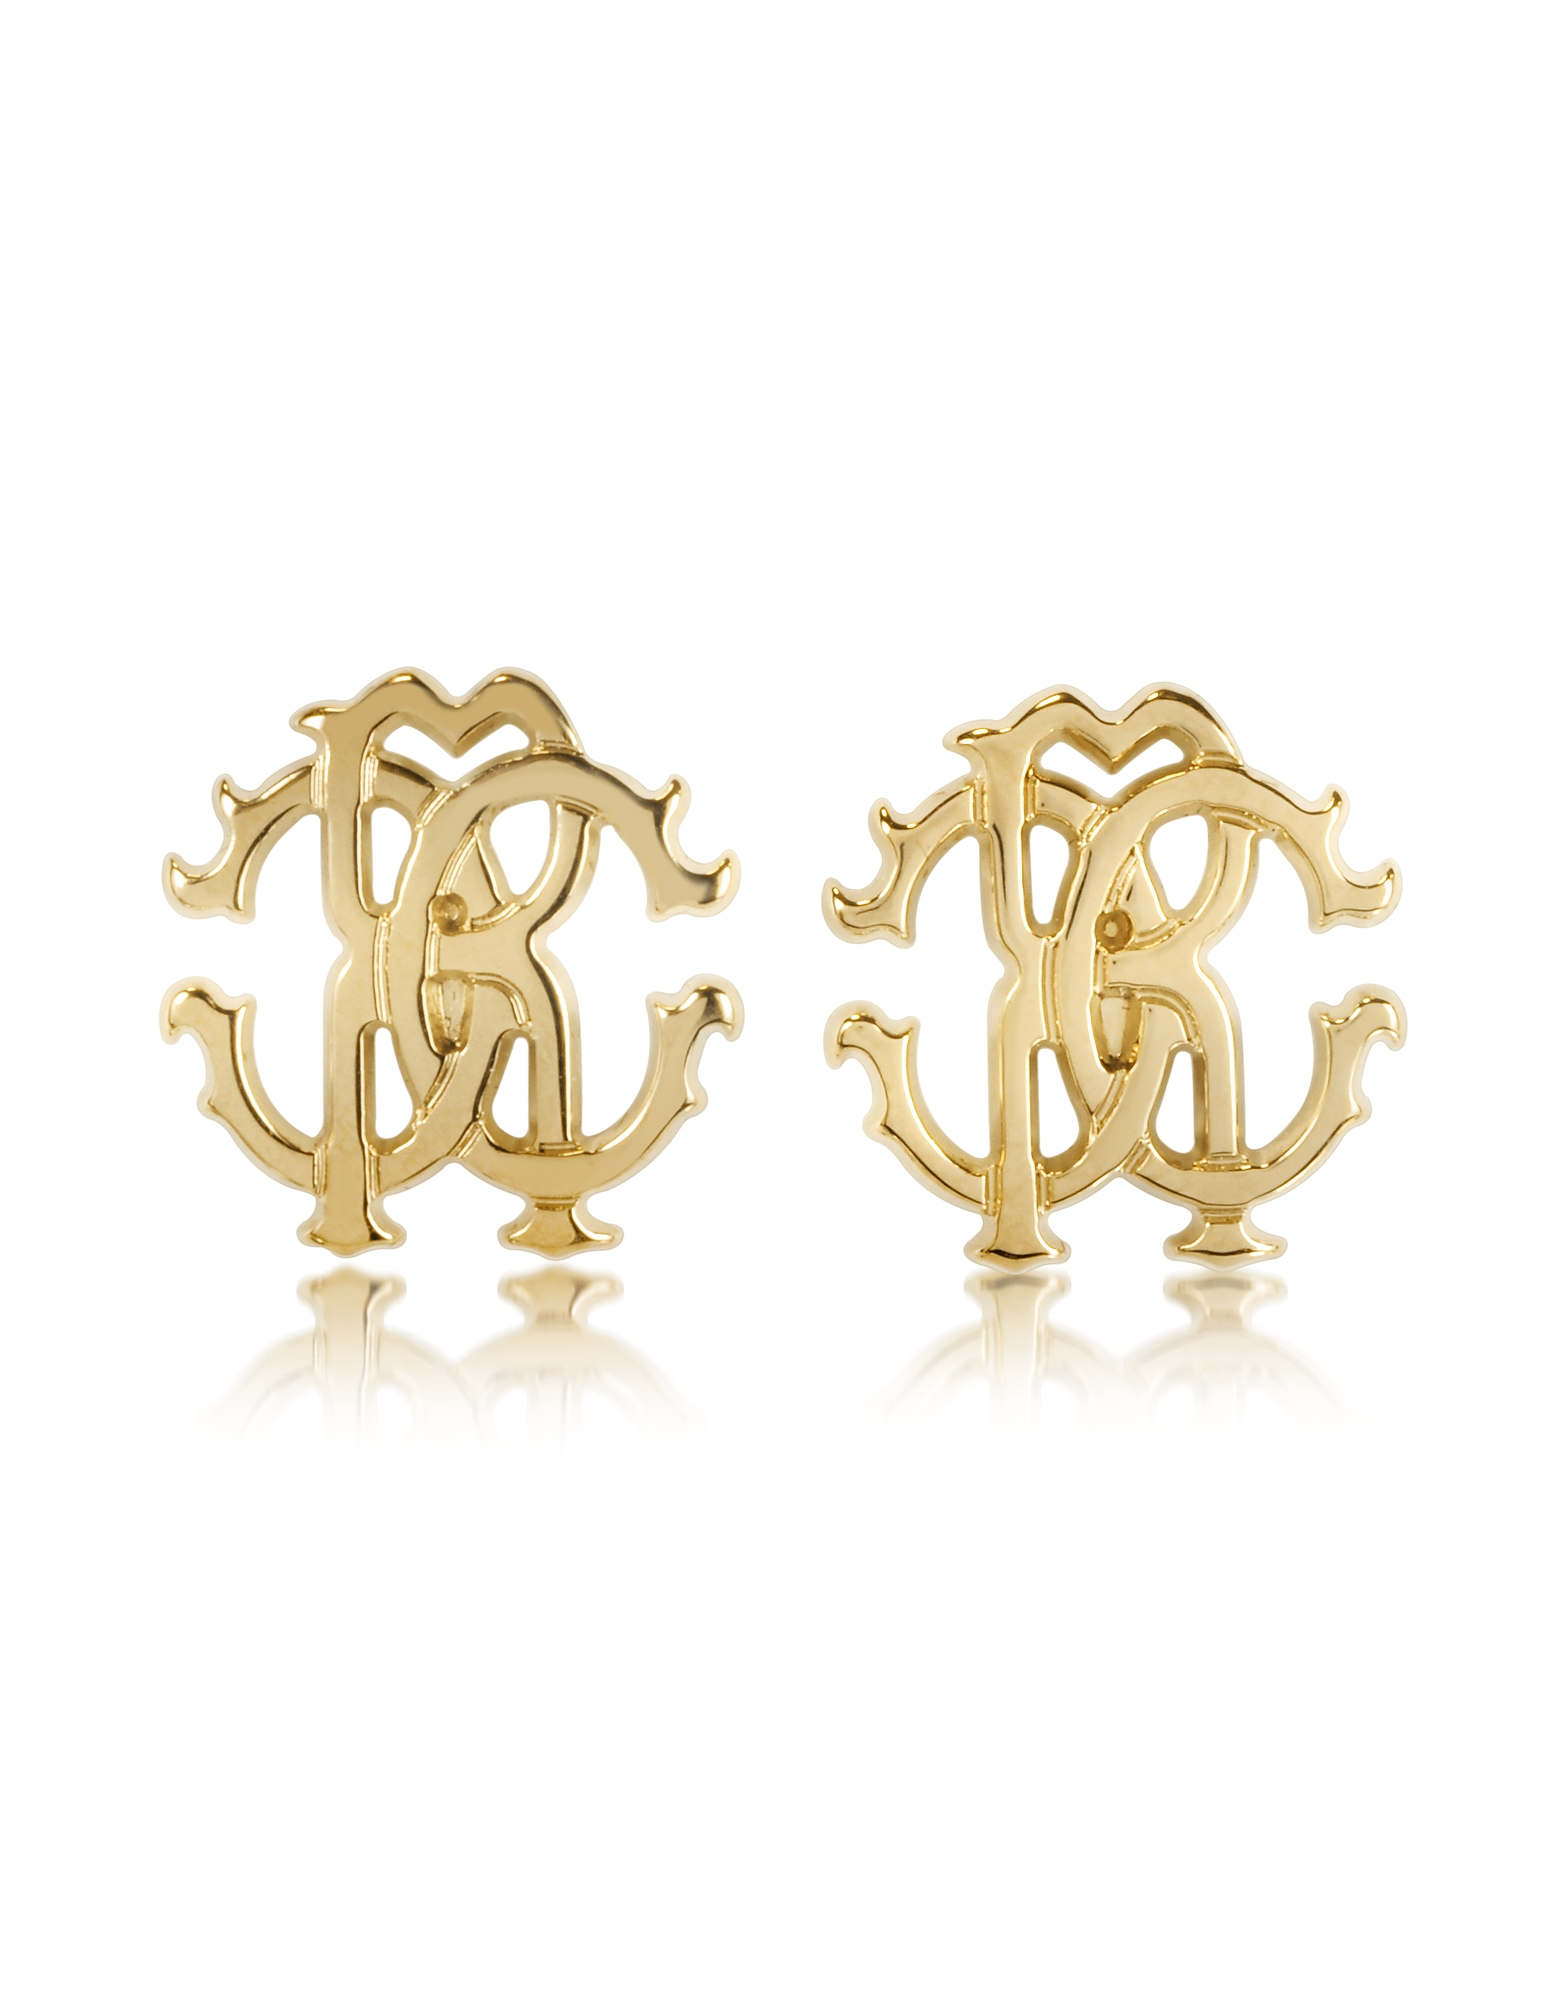 Roberto Cavalli Earrings, RC Lux Golden Stud Earrings